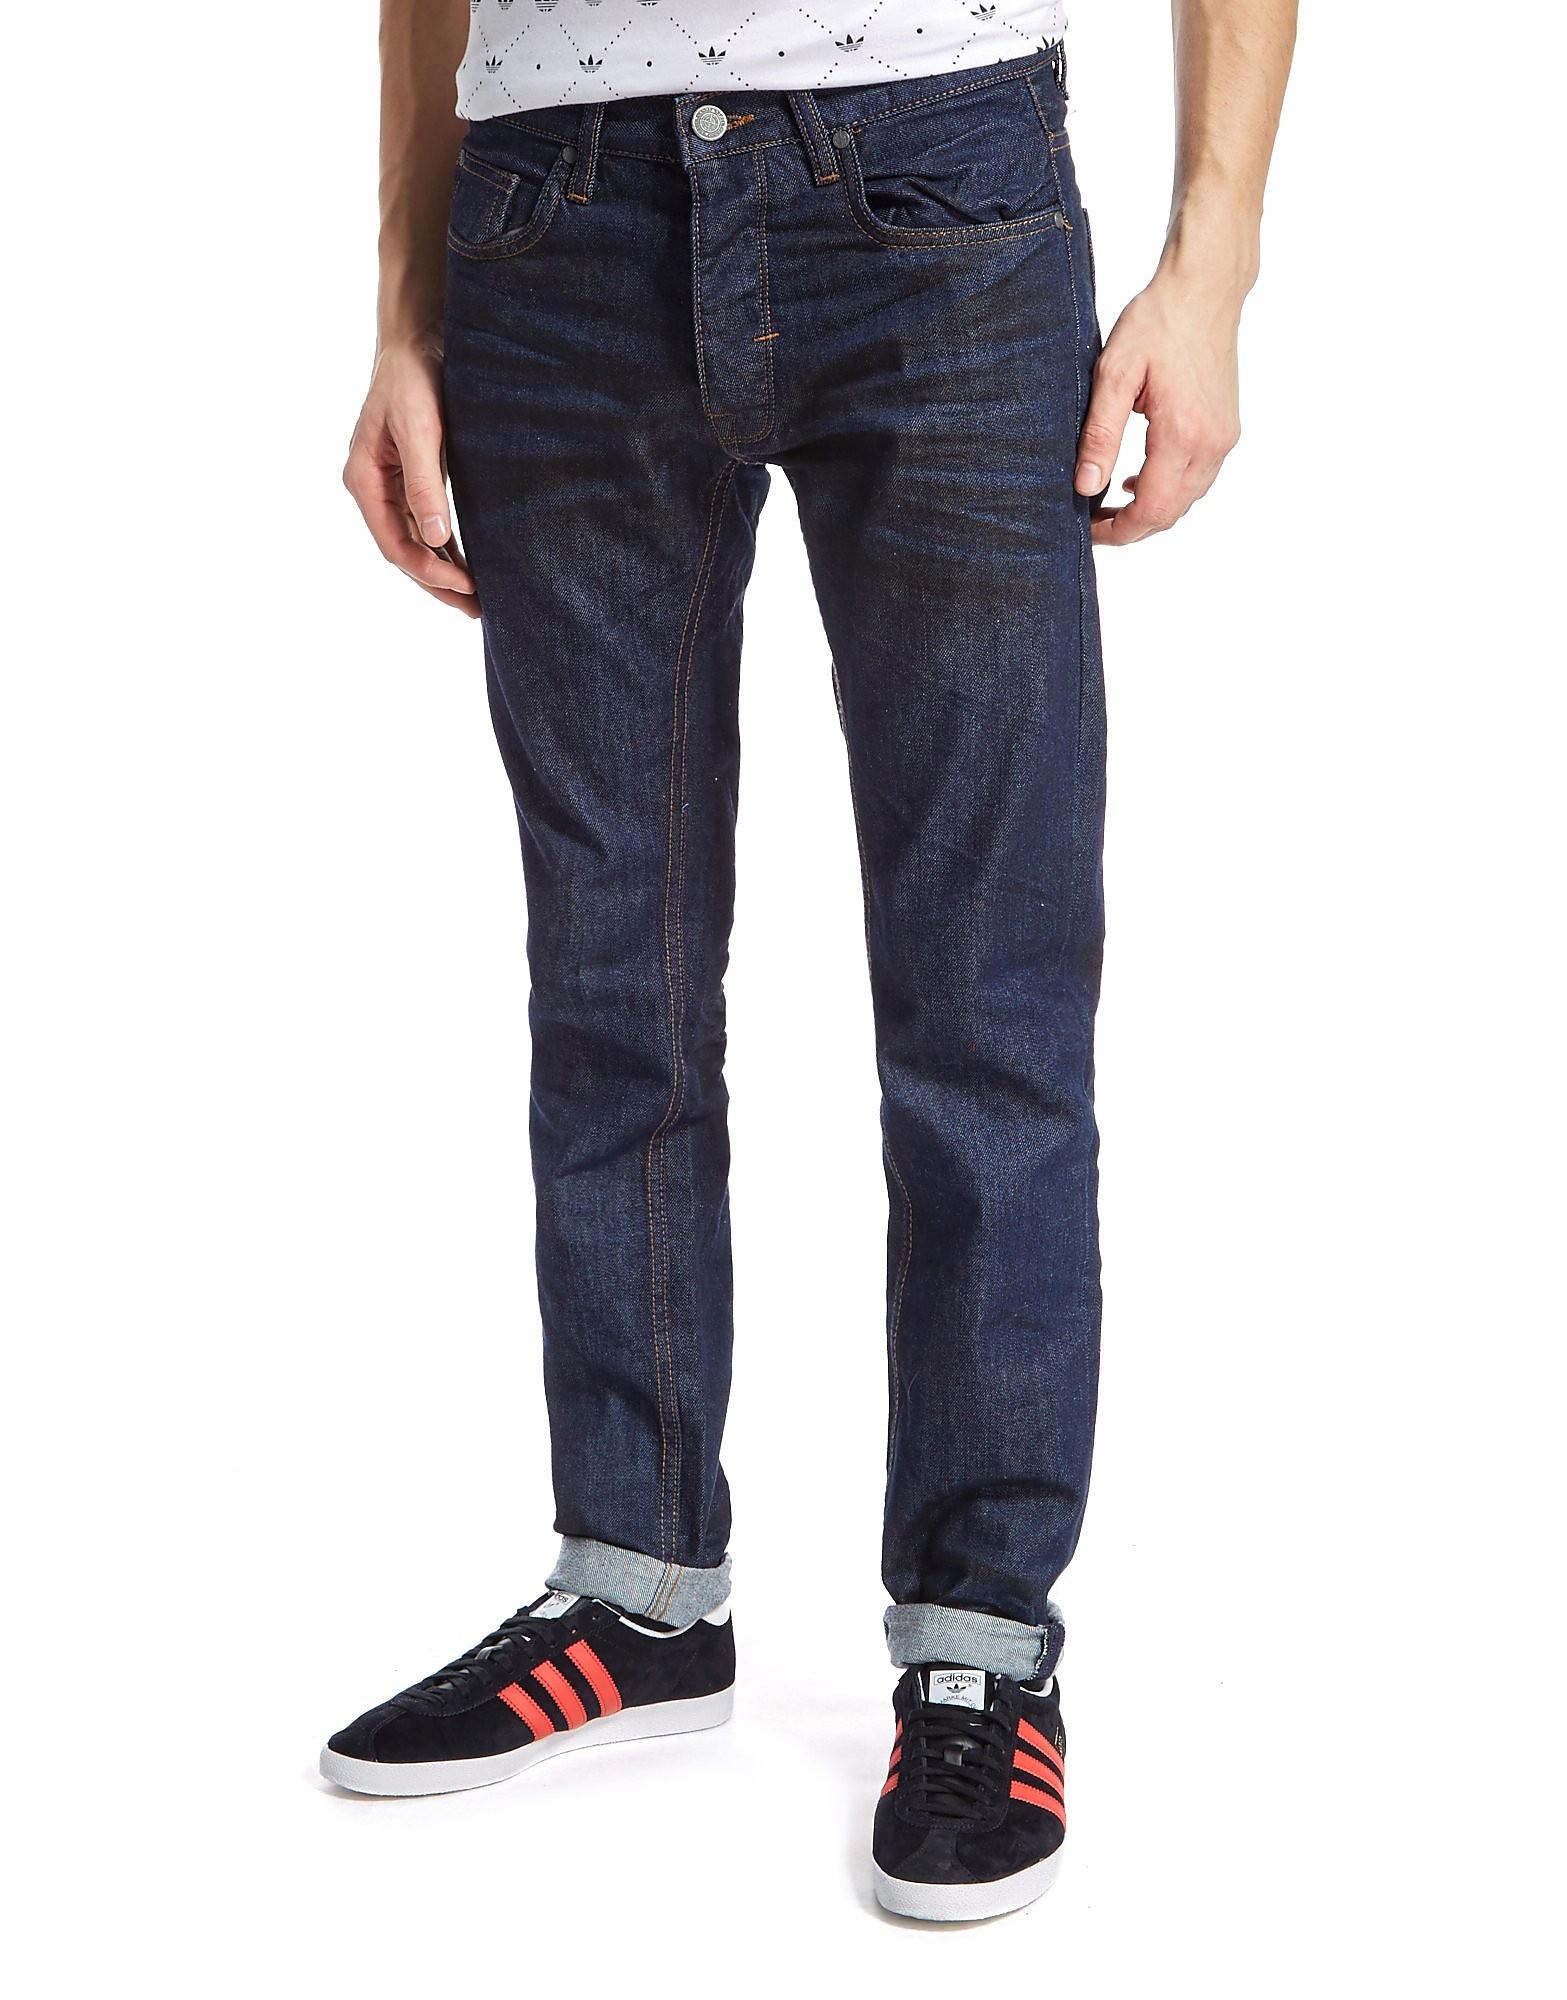 Nanny State Luke Tapered Jeans